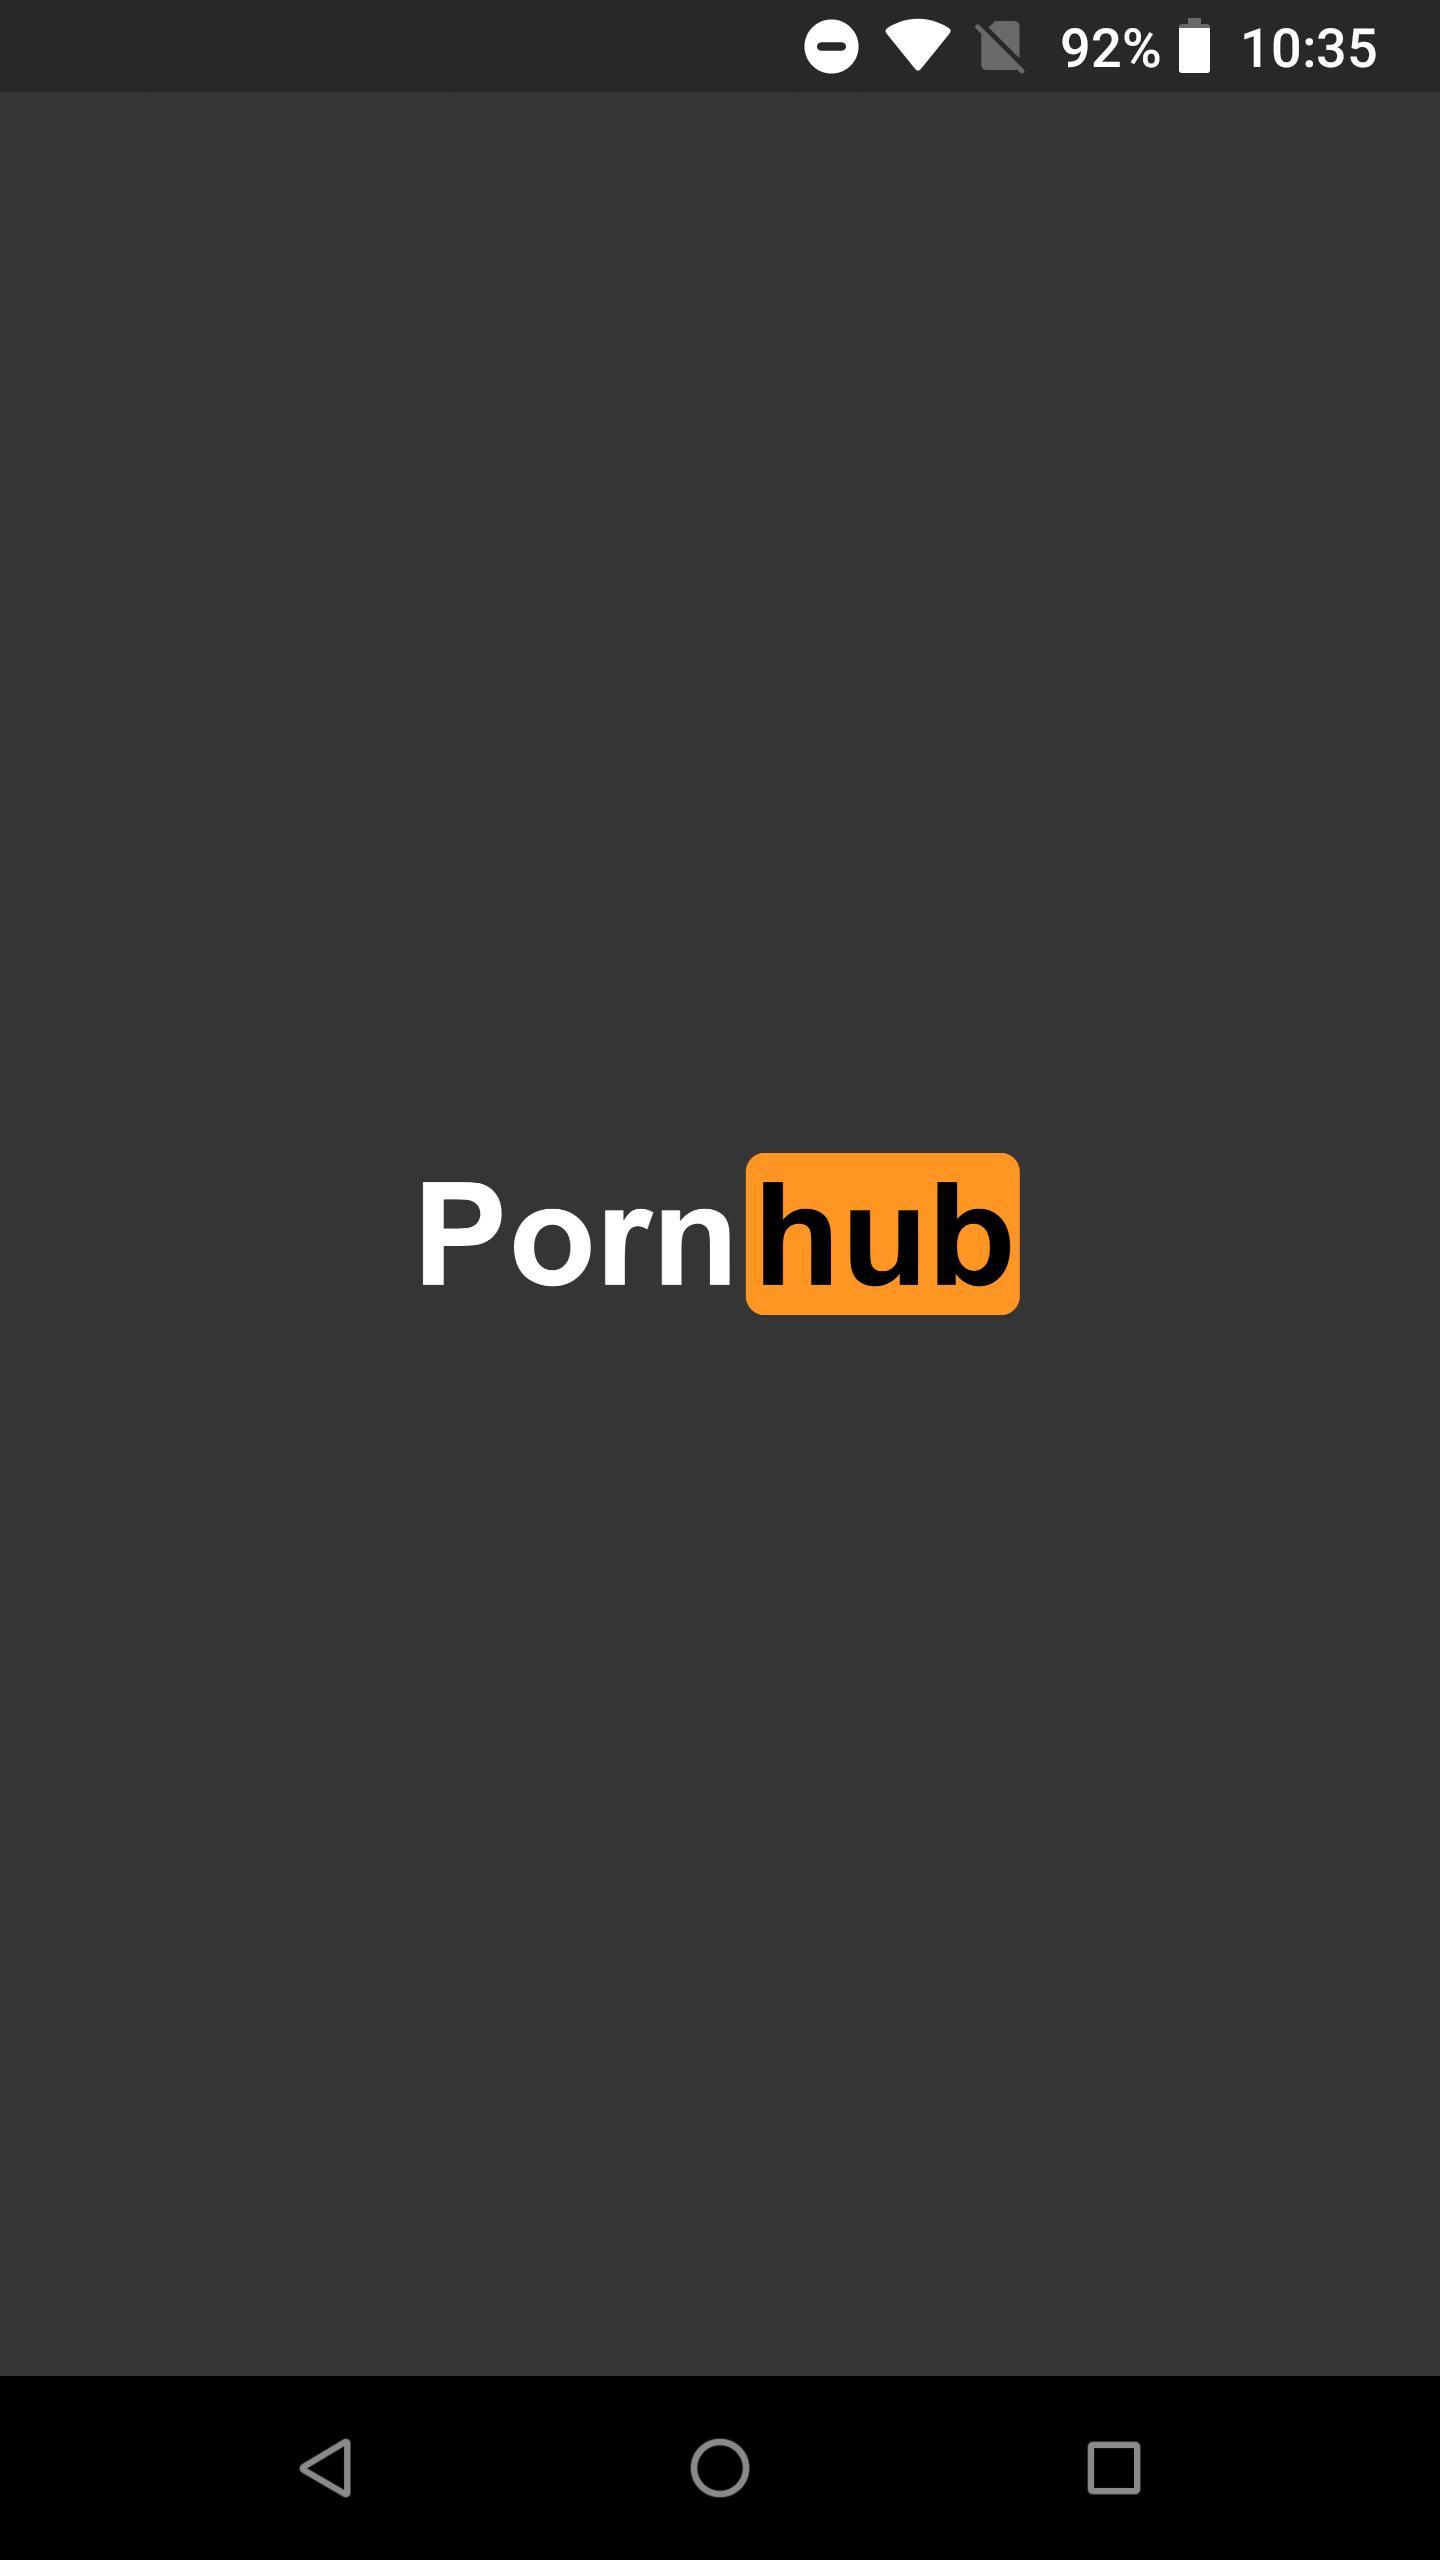 Application Porn pornhub for android - apk download